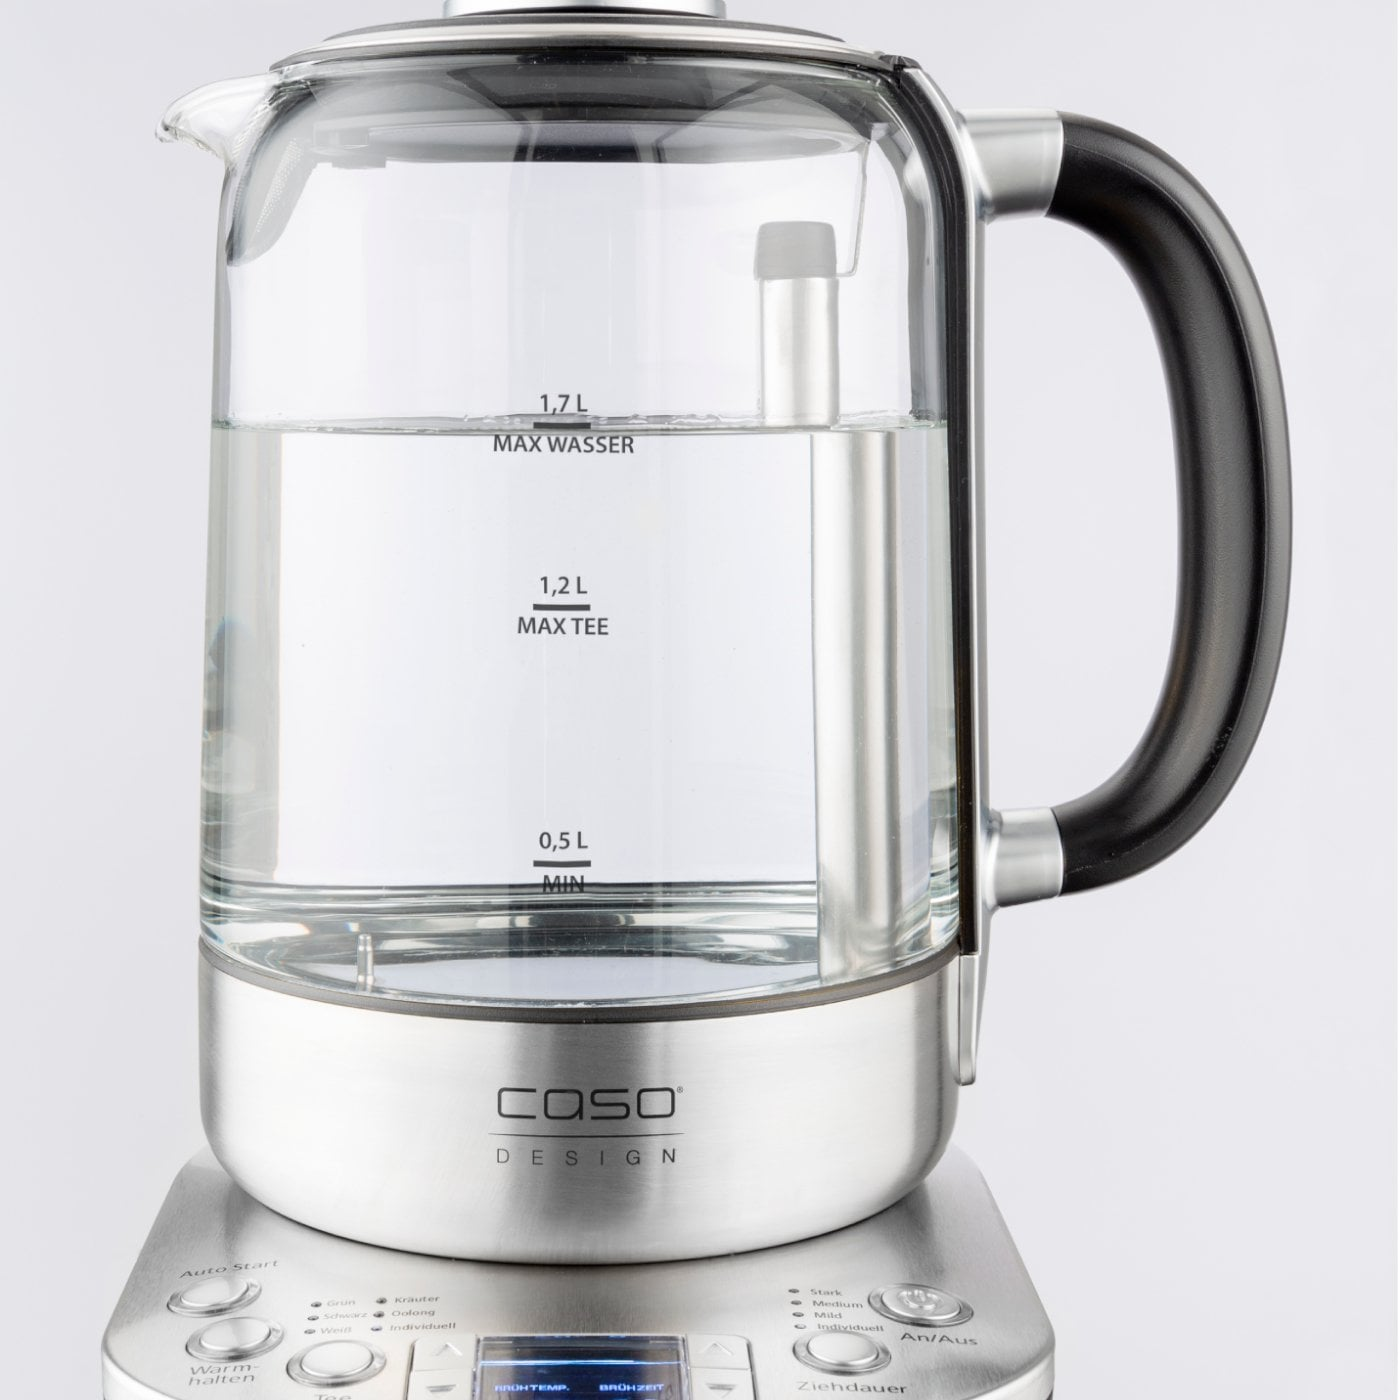 Www Pro Design Com design tea maker with auto lift function caso teegourmet pro